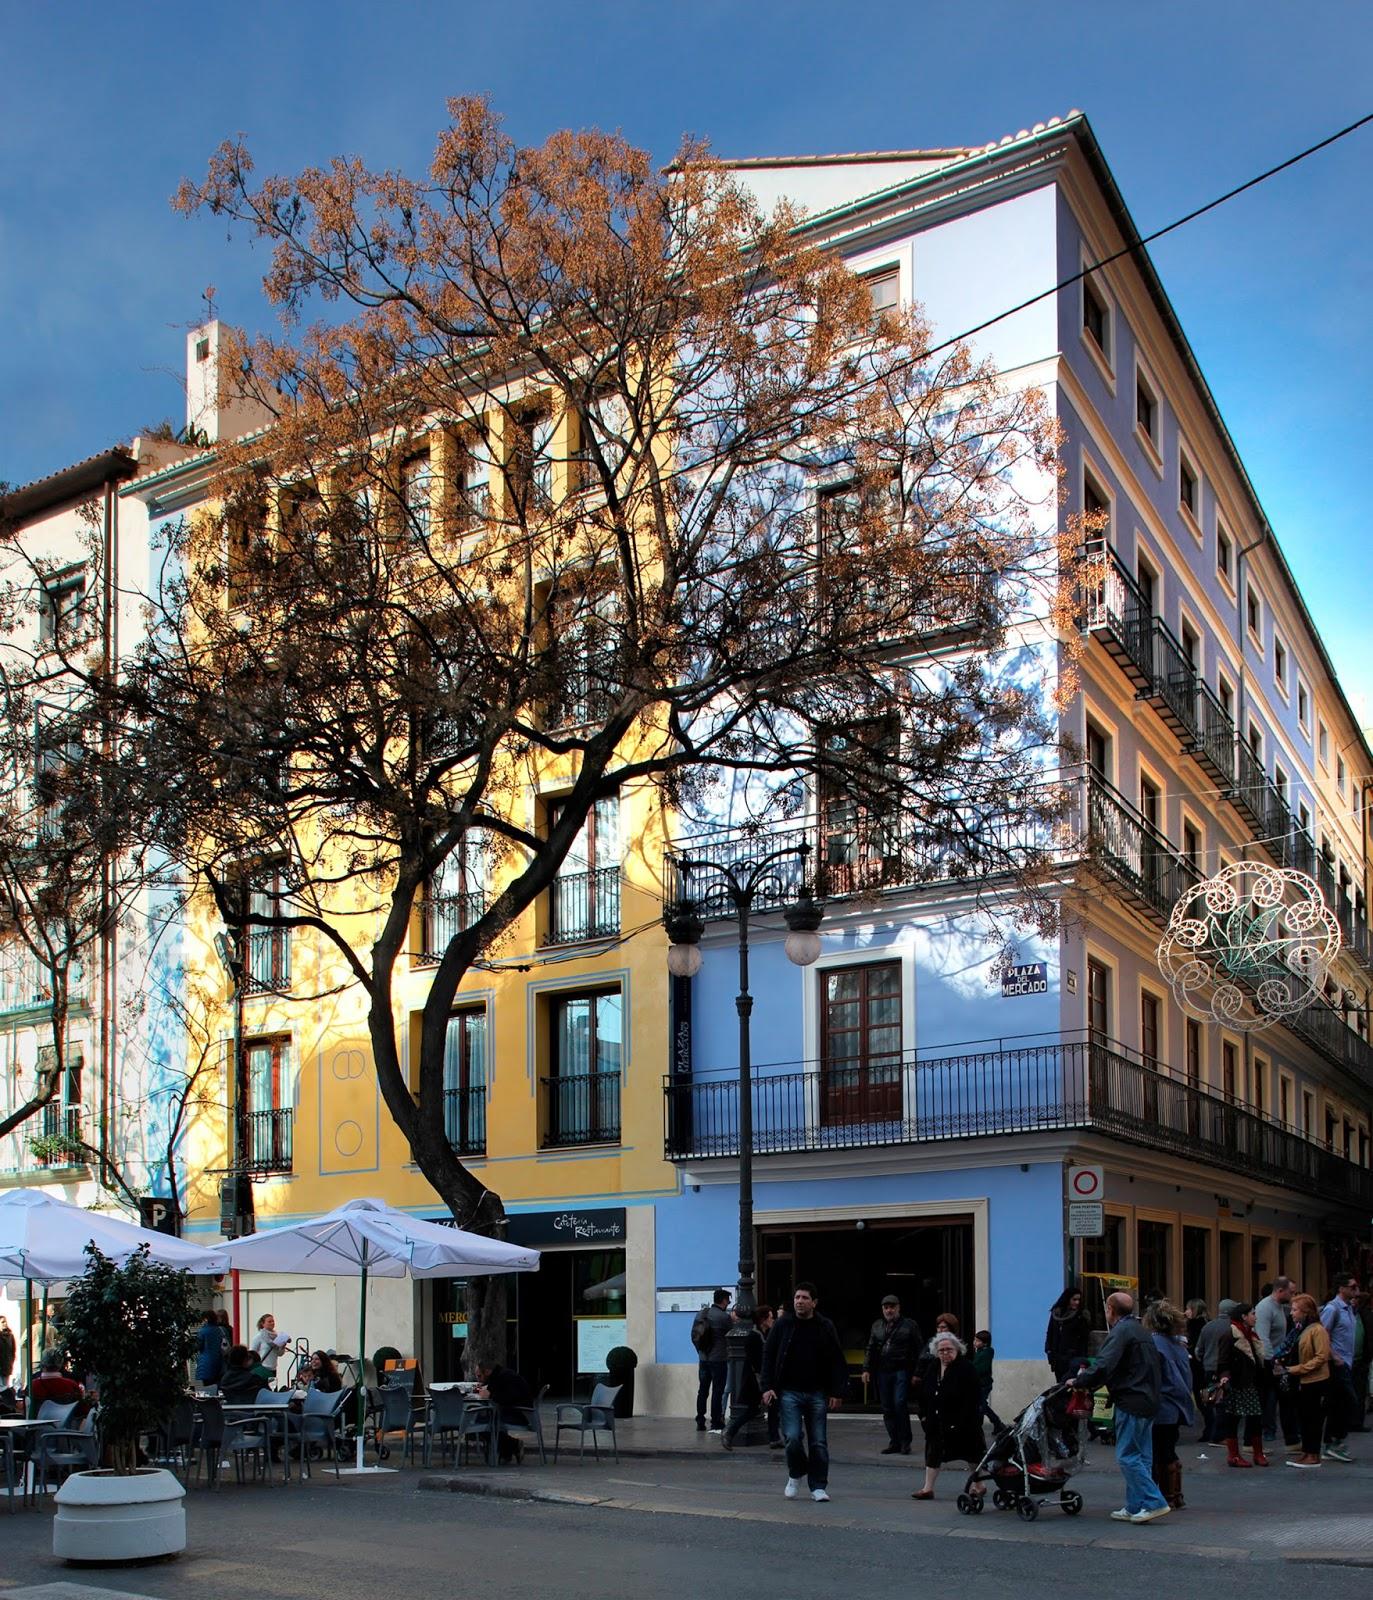 Viccarbe myr hotel plaza mercado valence agence at for Hotel design valence